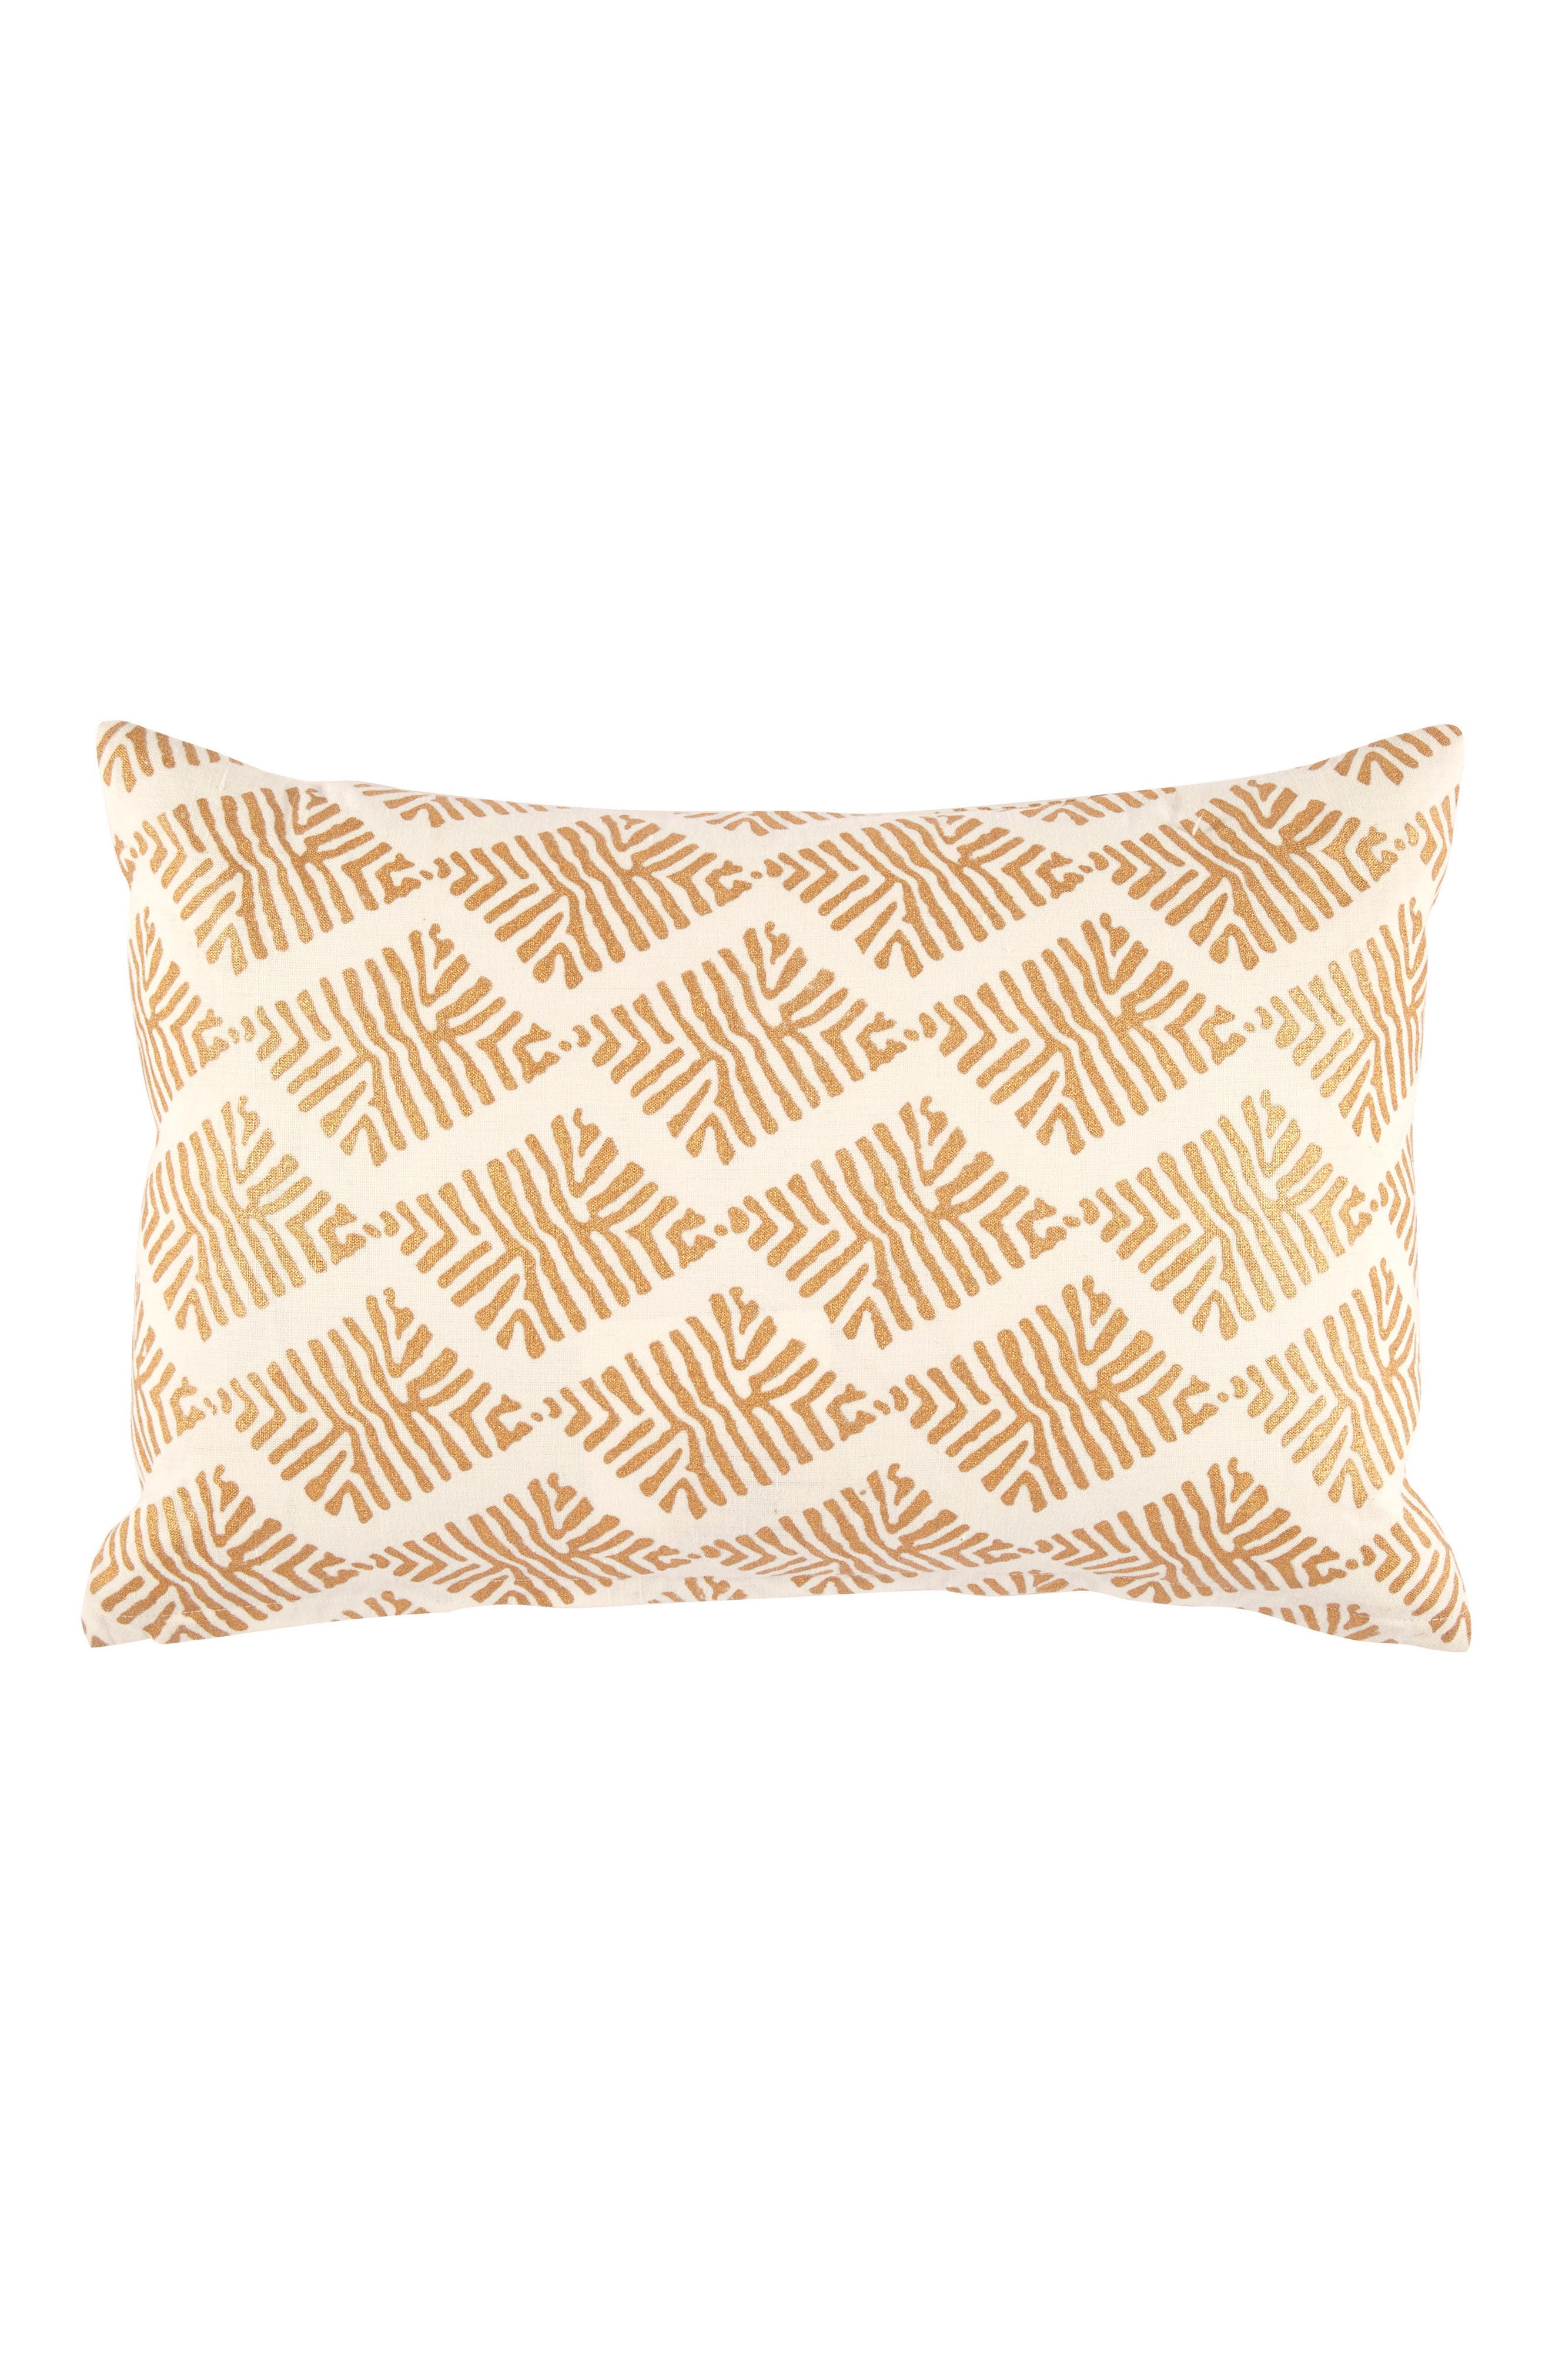 Sharak Accent Pillow,                             Main thumbnail 1, color,                             710